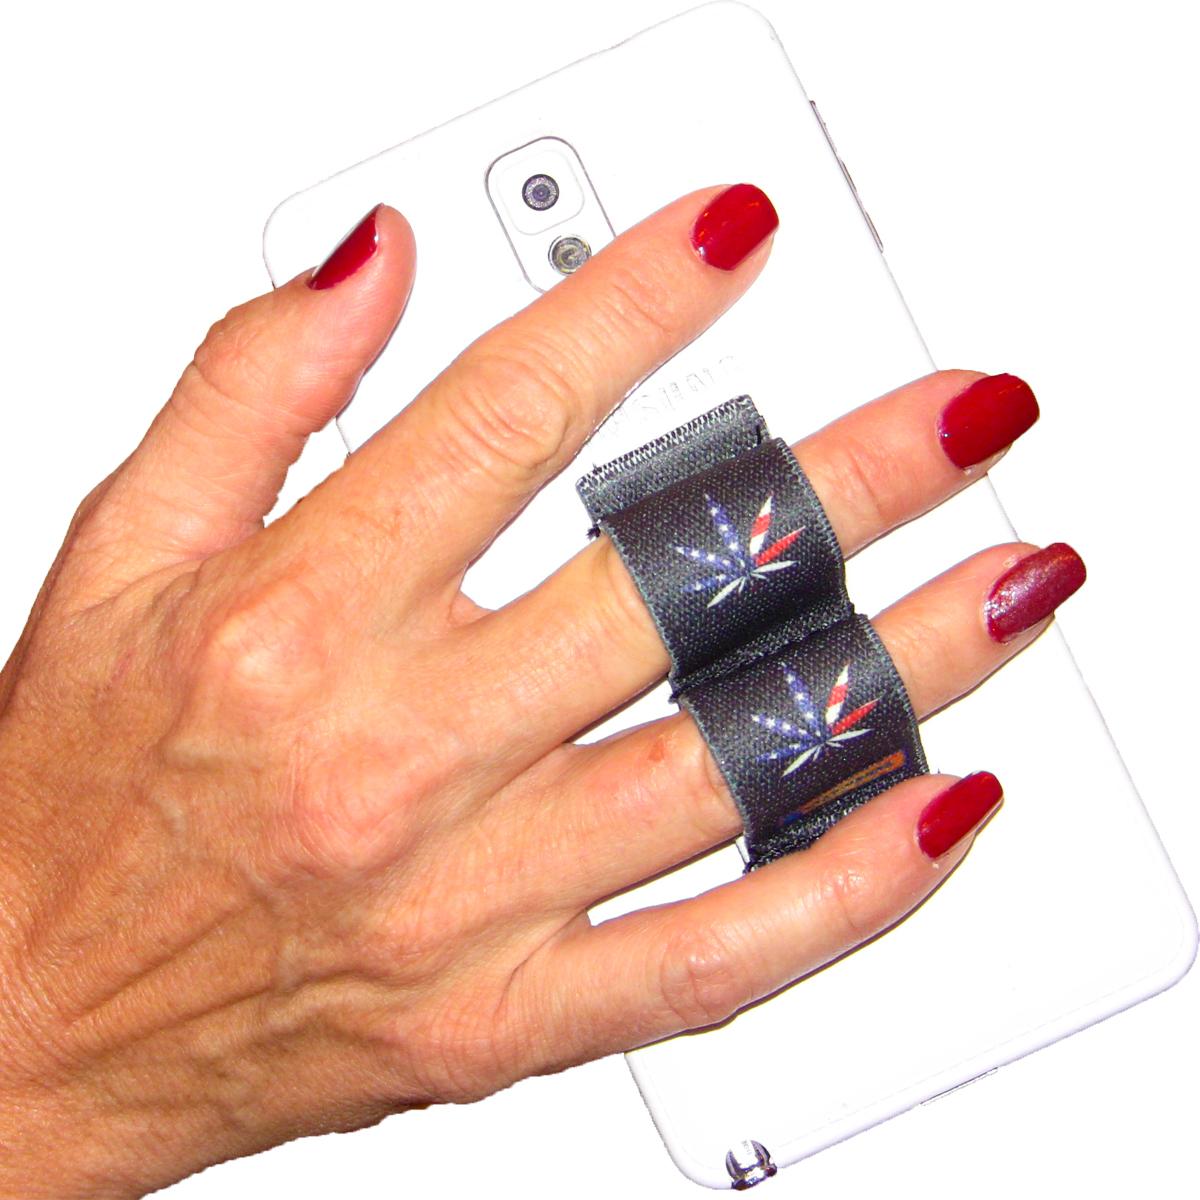 2-Loop Phone Grip - Pot Leaf USA